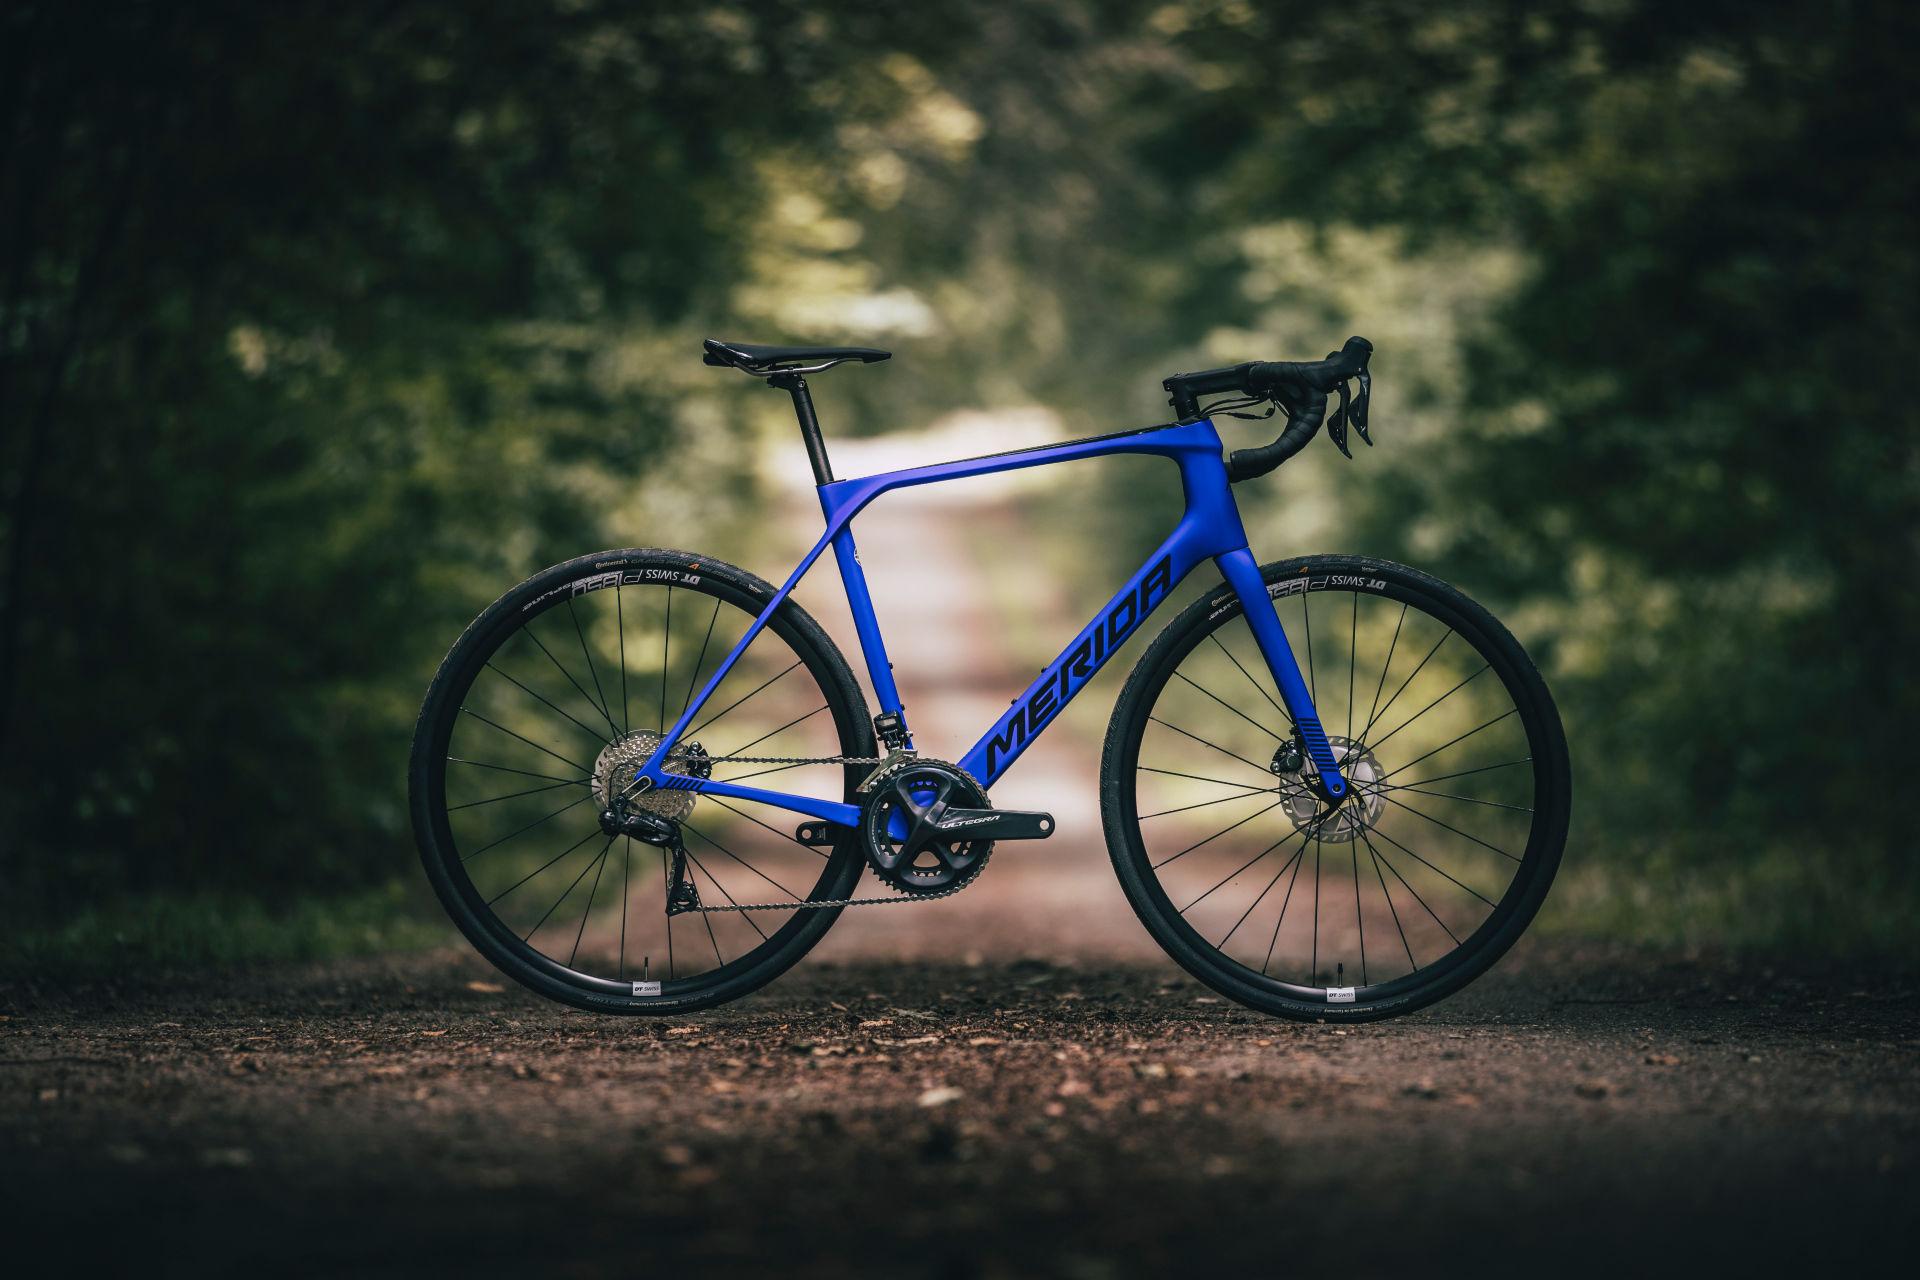 Merida Scultura Endurance, Scultura Endurance, rower endurance, rower szosowy endurance, szosa endurance, rower szosowy, rowery szosowe, szosa, rower szosa, rowery Merida